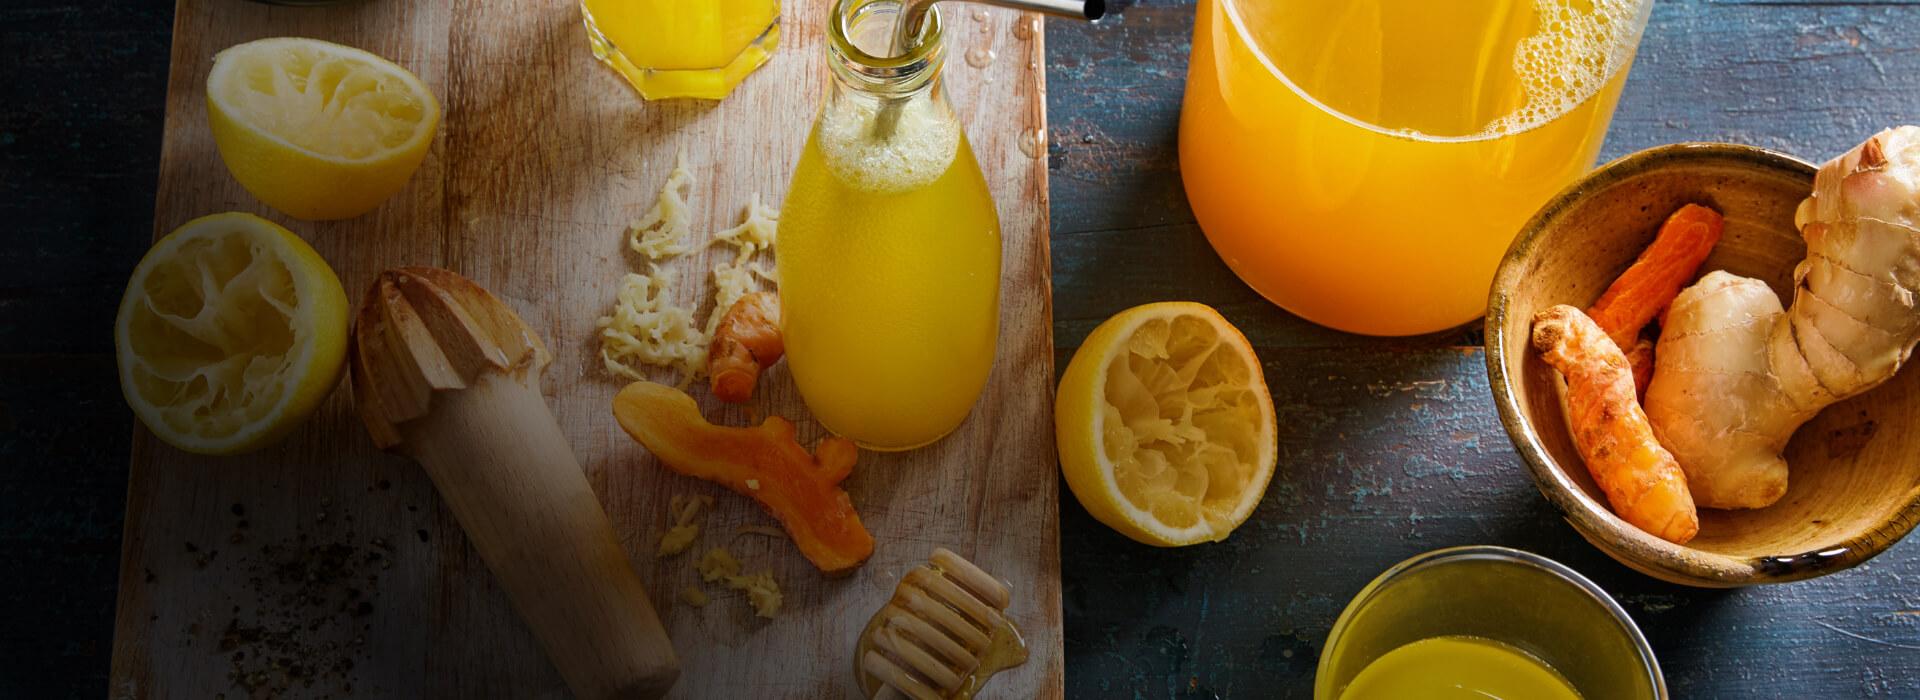 Turmeric-and-Ginger-Lemonade.jpg